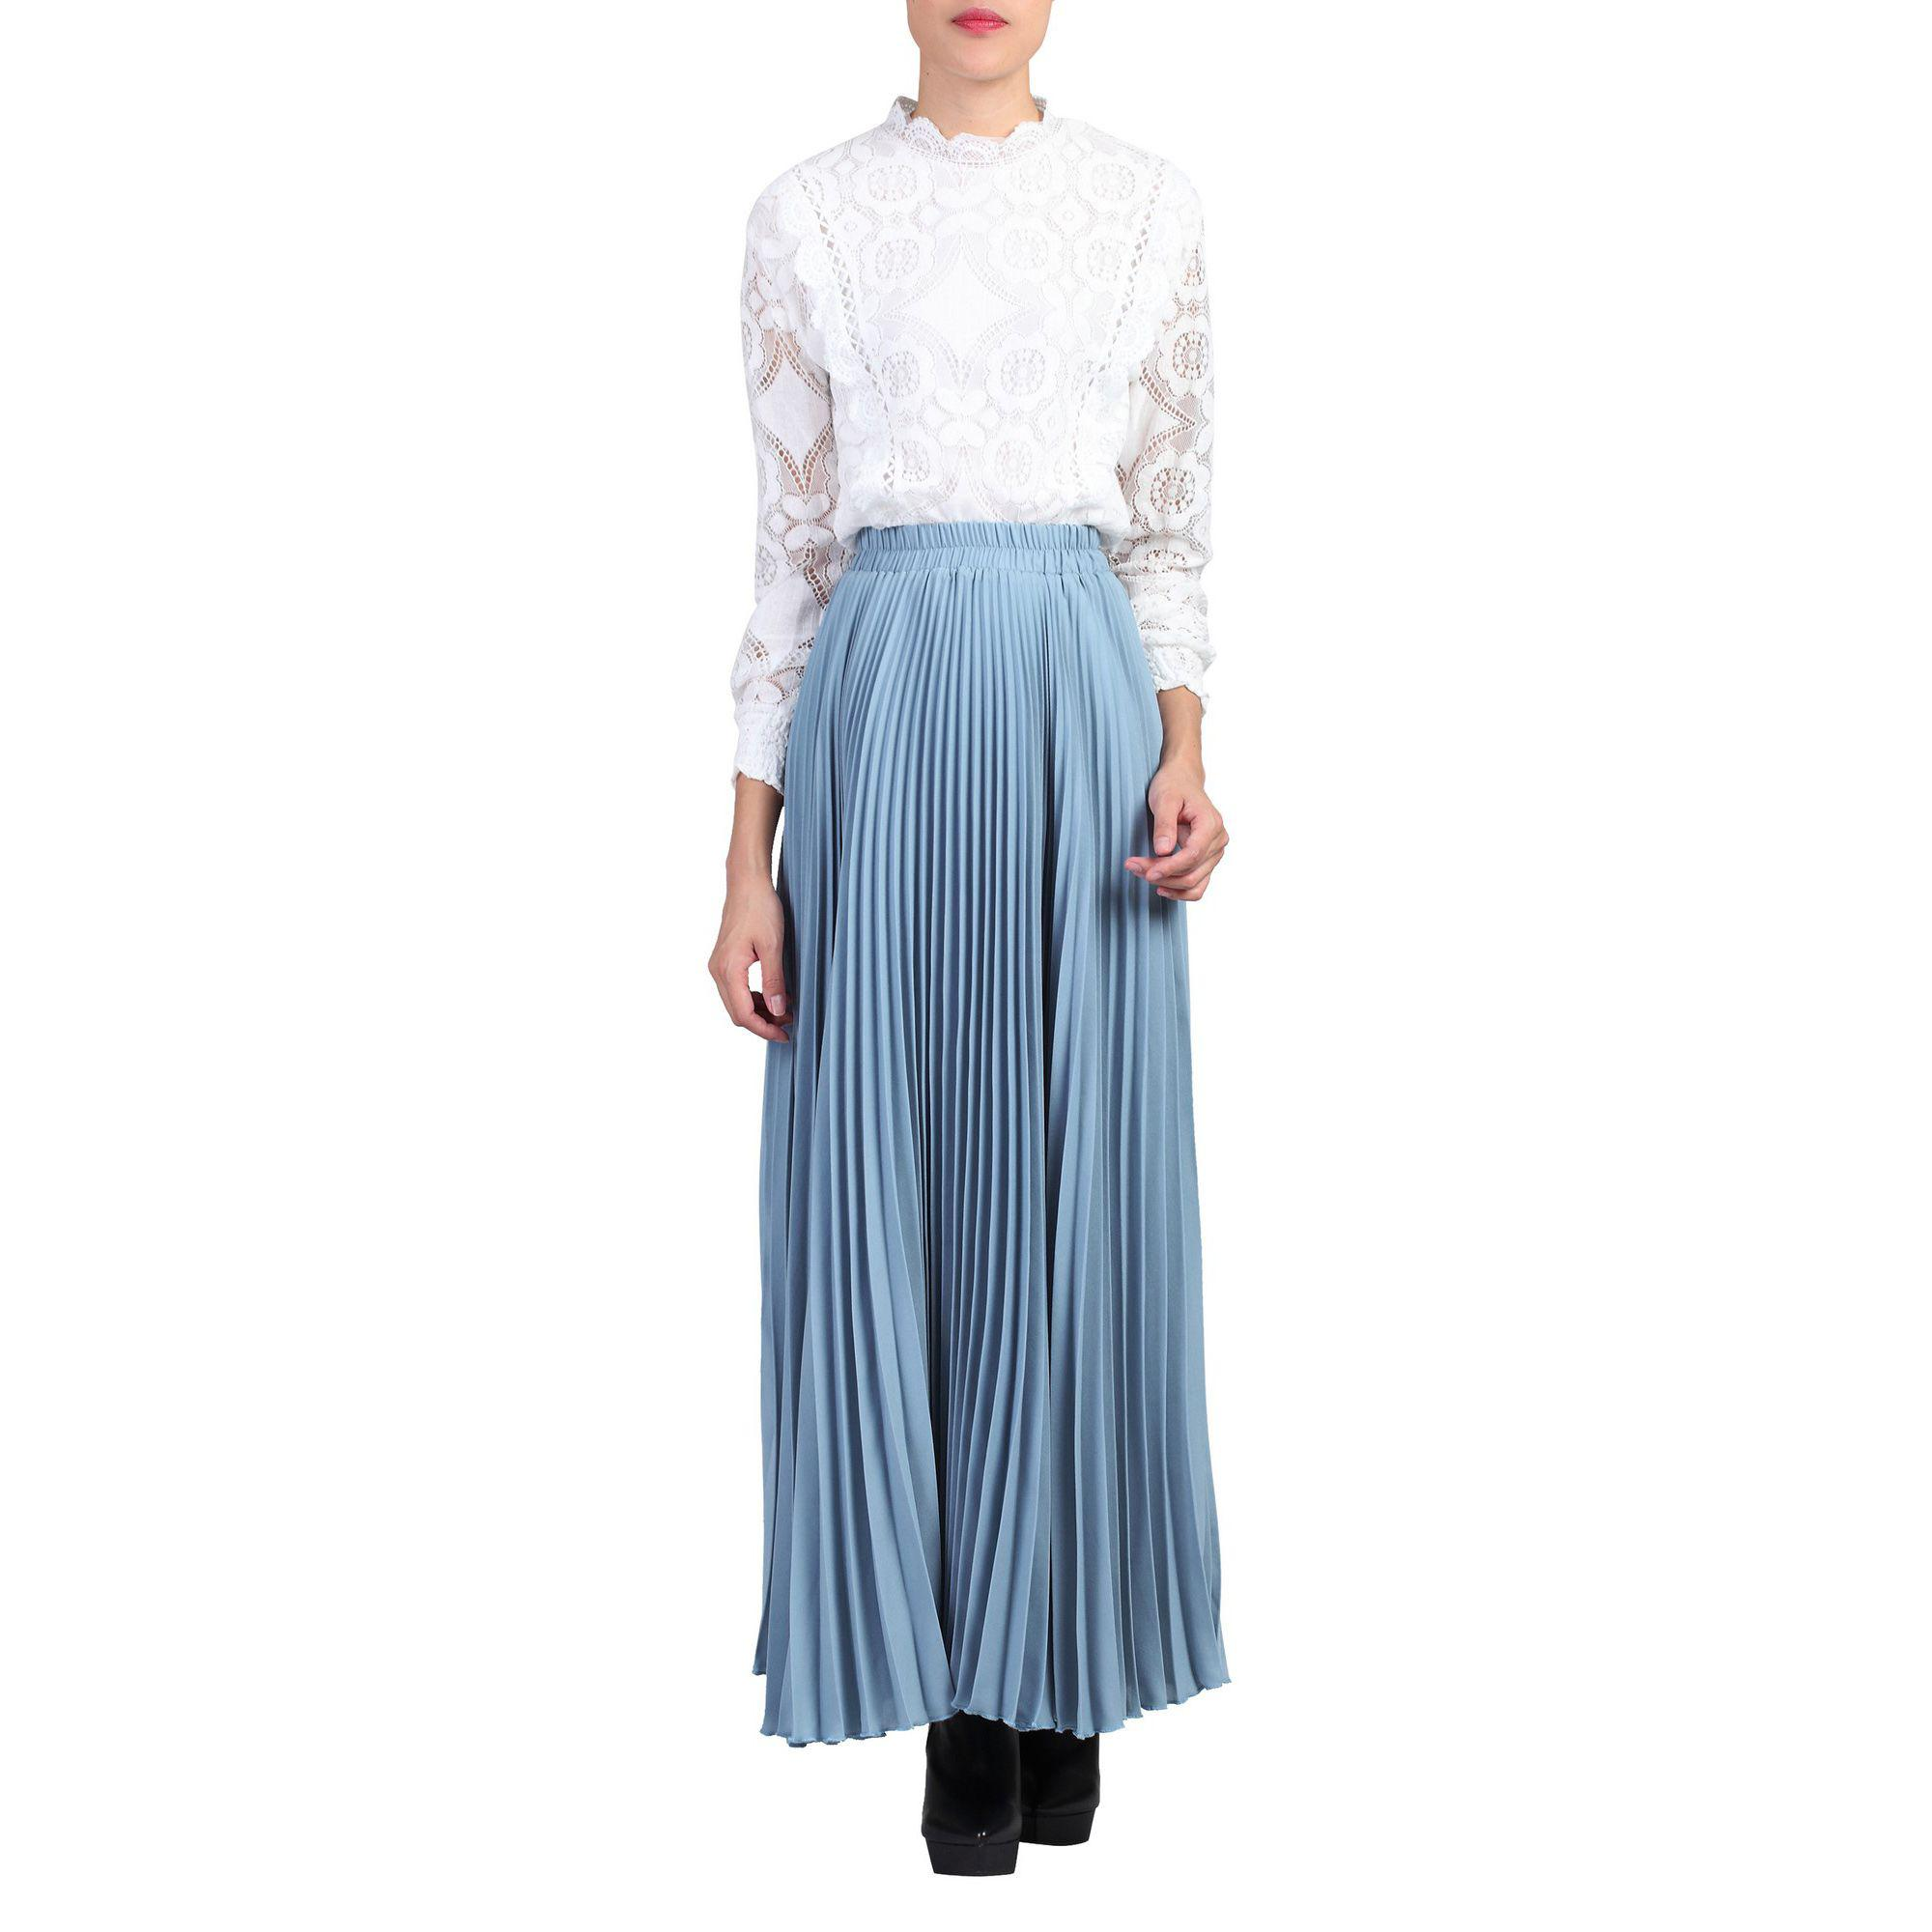 d2b9943503 Jolie Moi Blue Pleated Crepe Maxi Skirt in Blue - Lyst